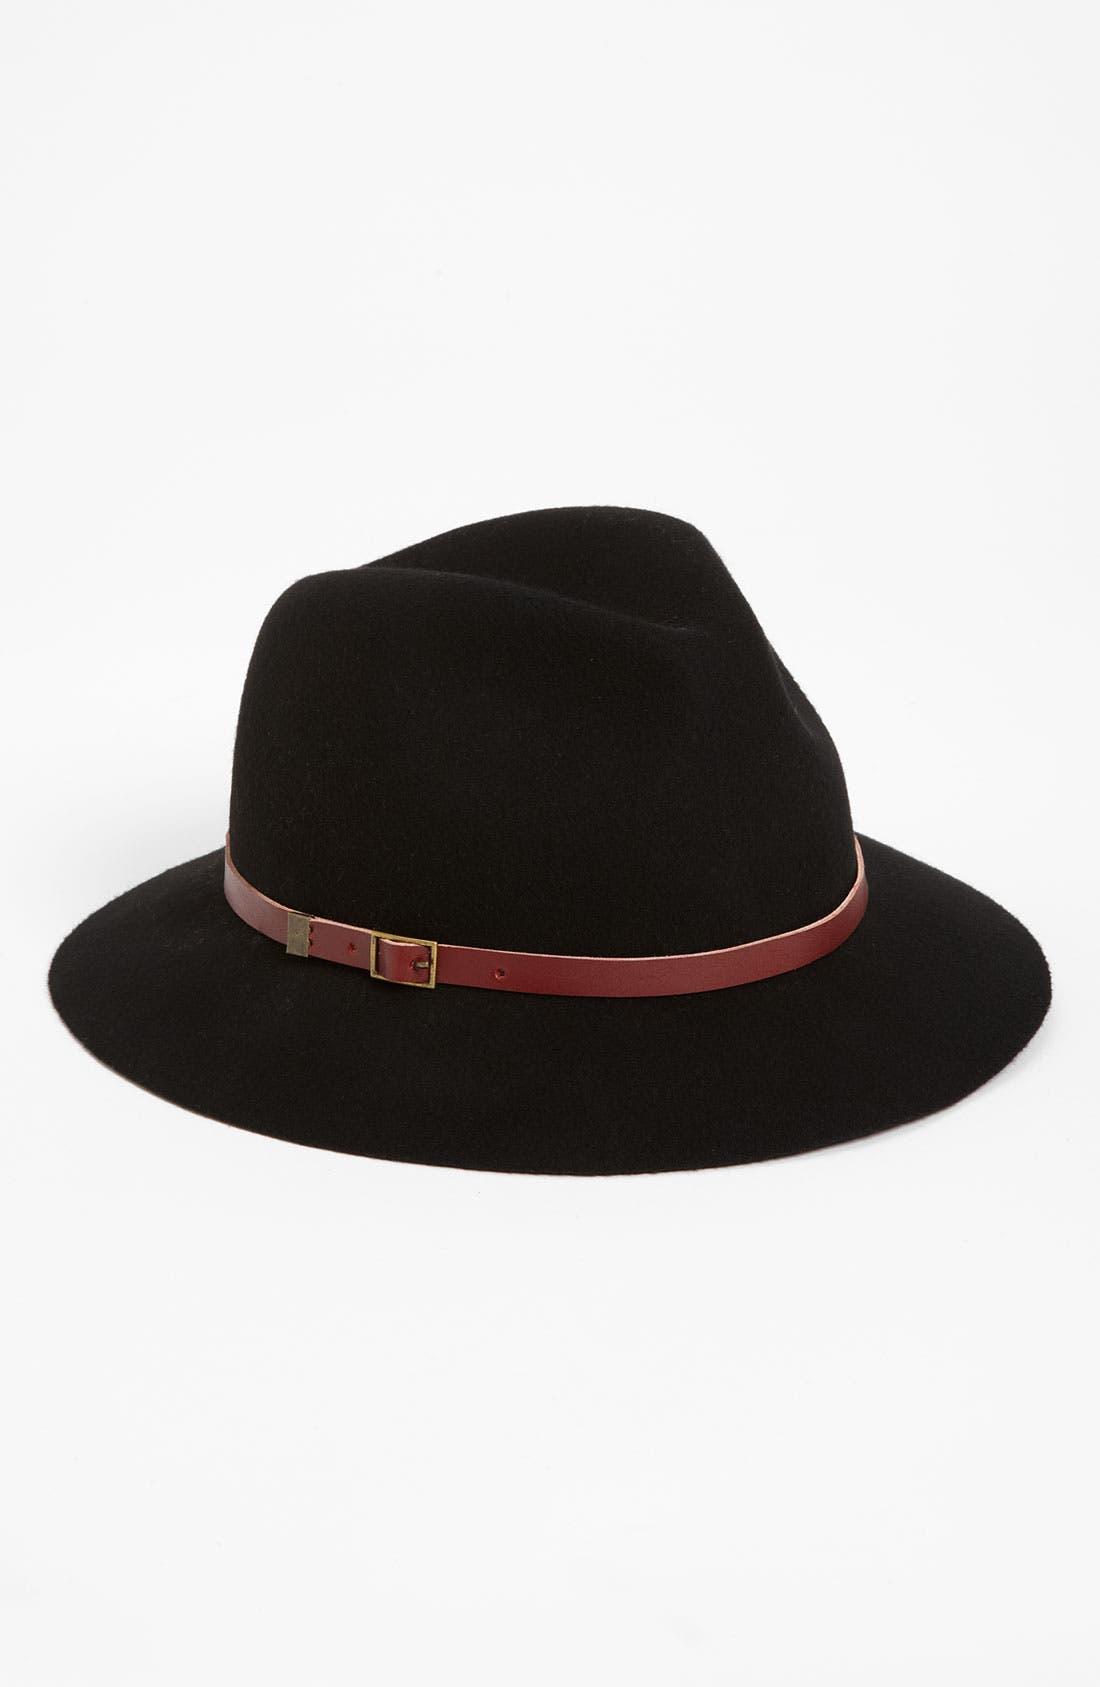 Main Image - Genie by Eugenia Kim 'Jordan' Wool Hat